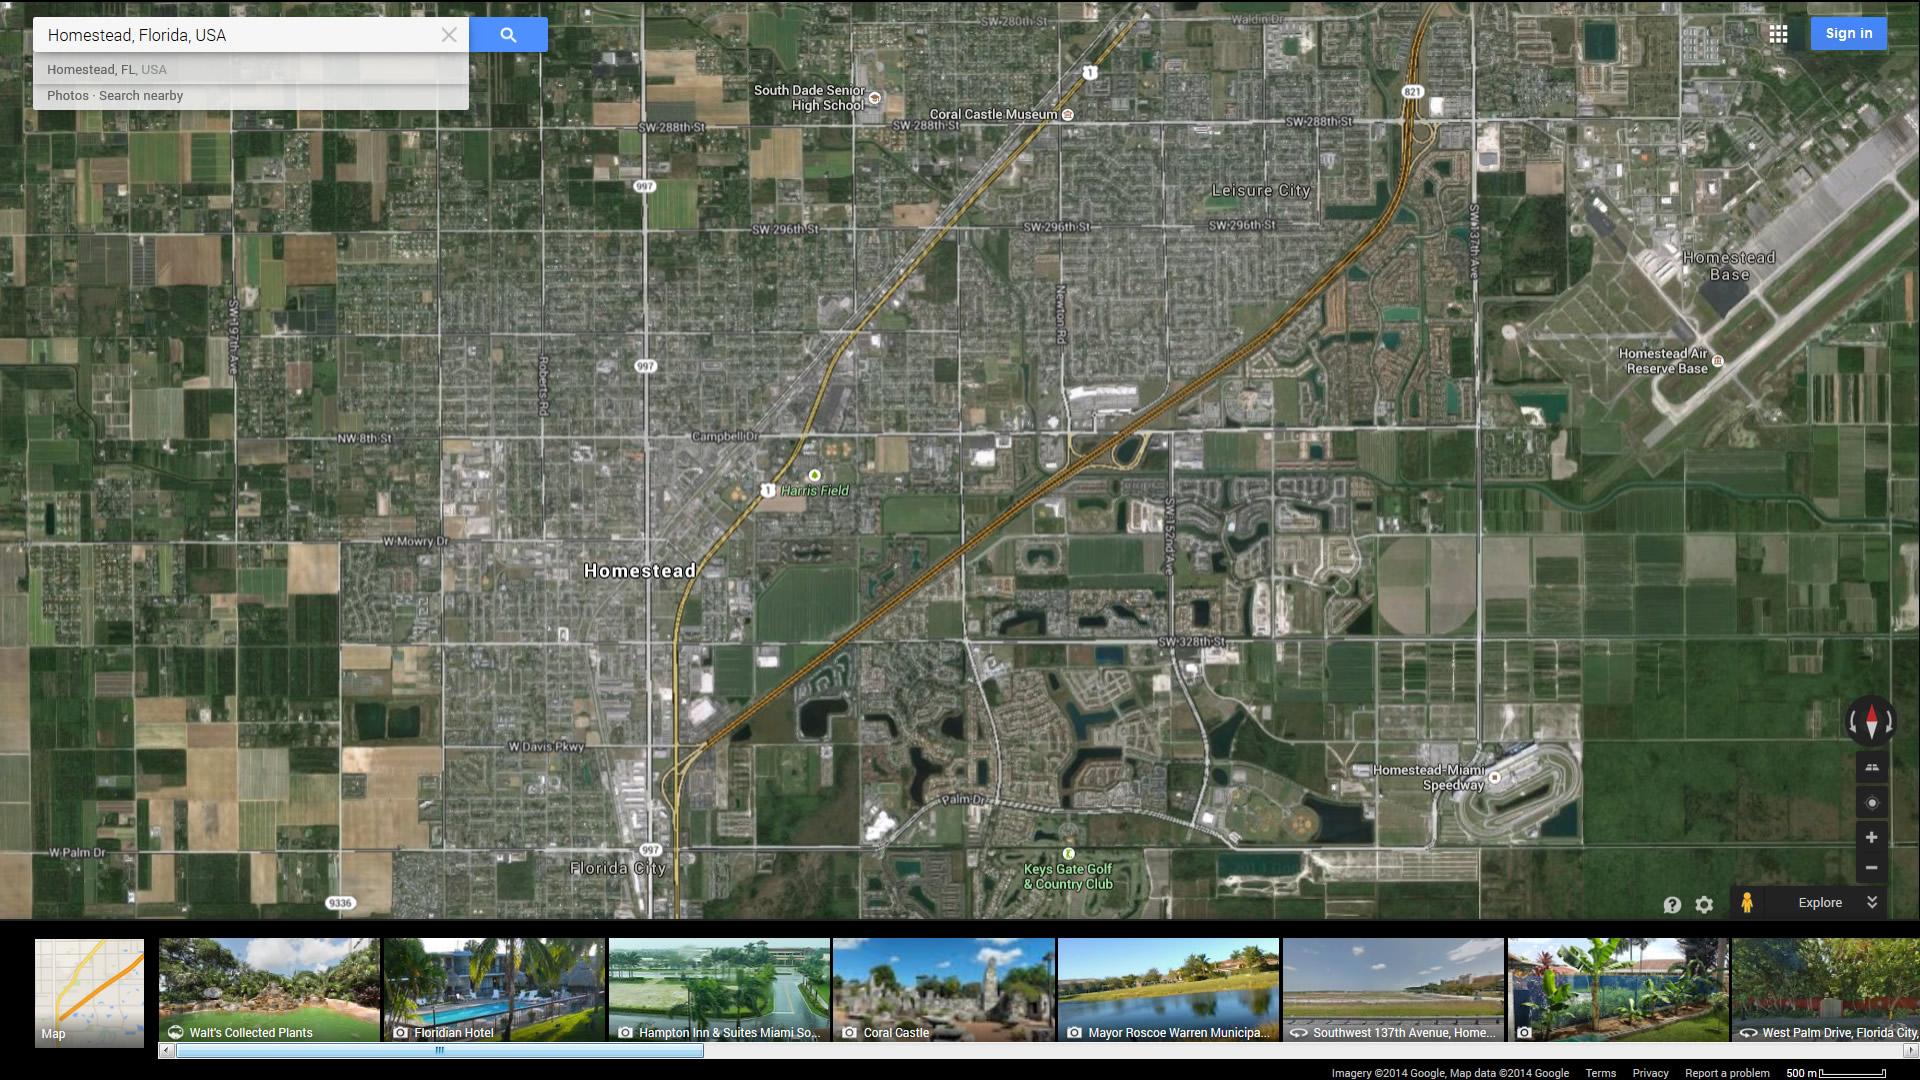 Map Homestead Florida.Homestead Florida Map